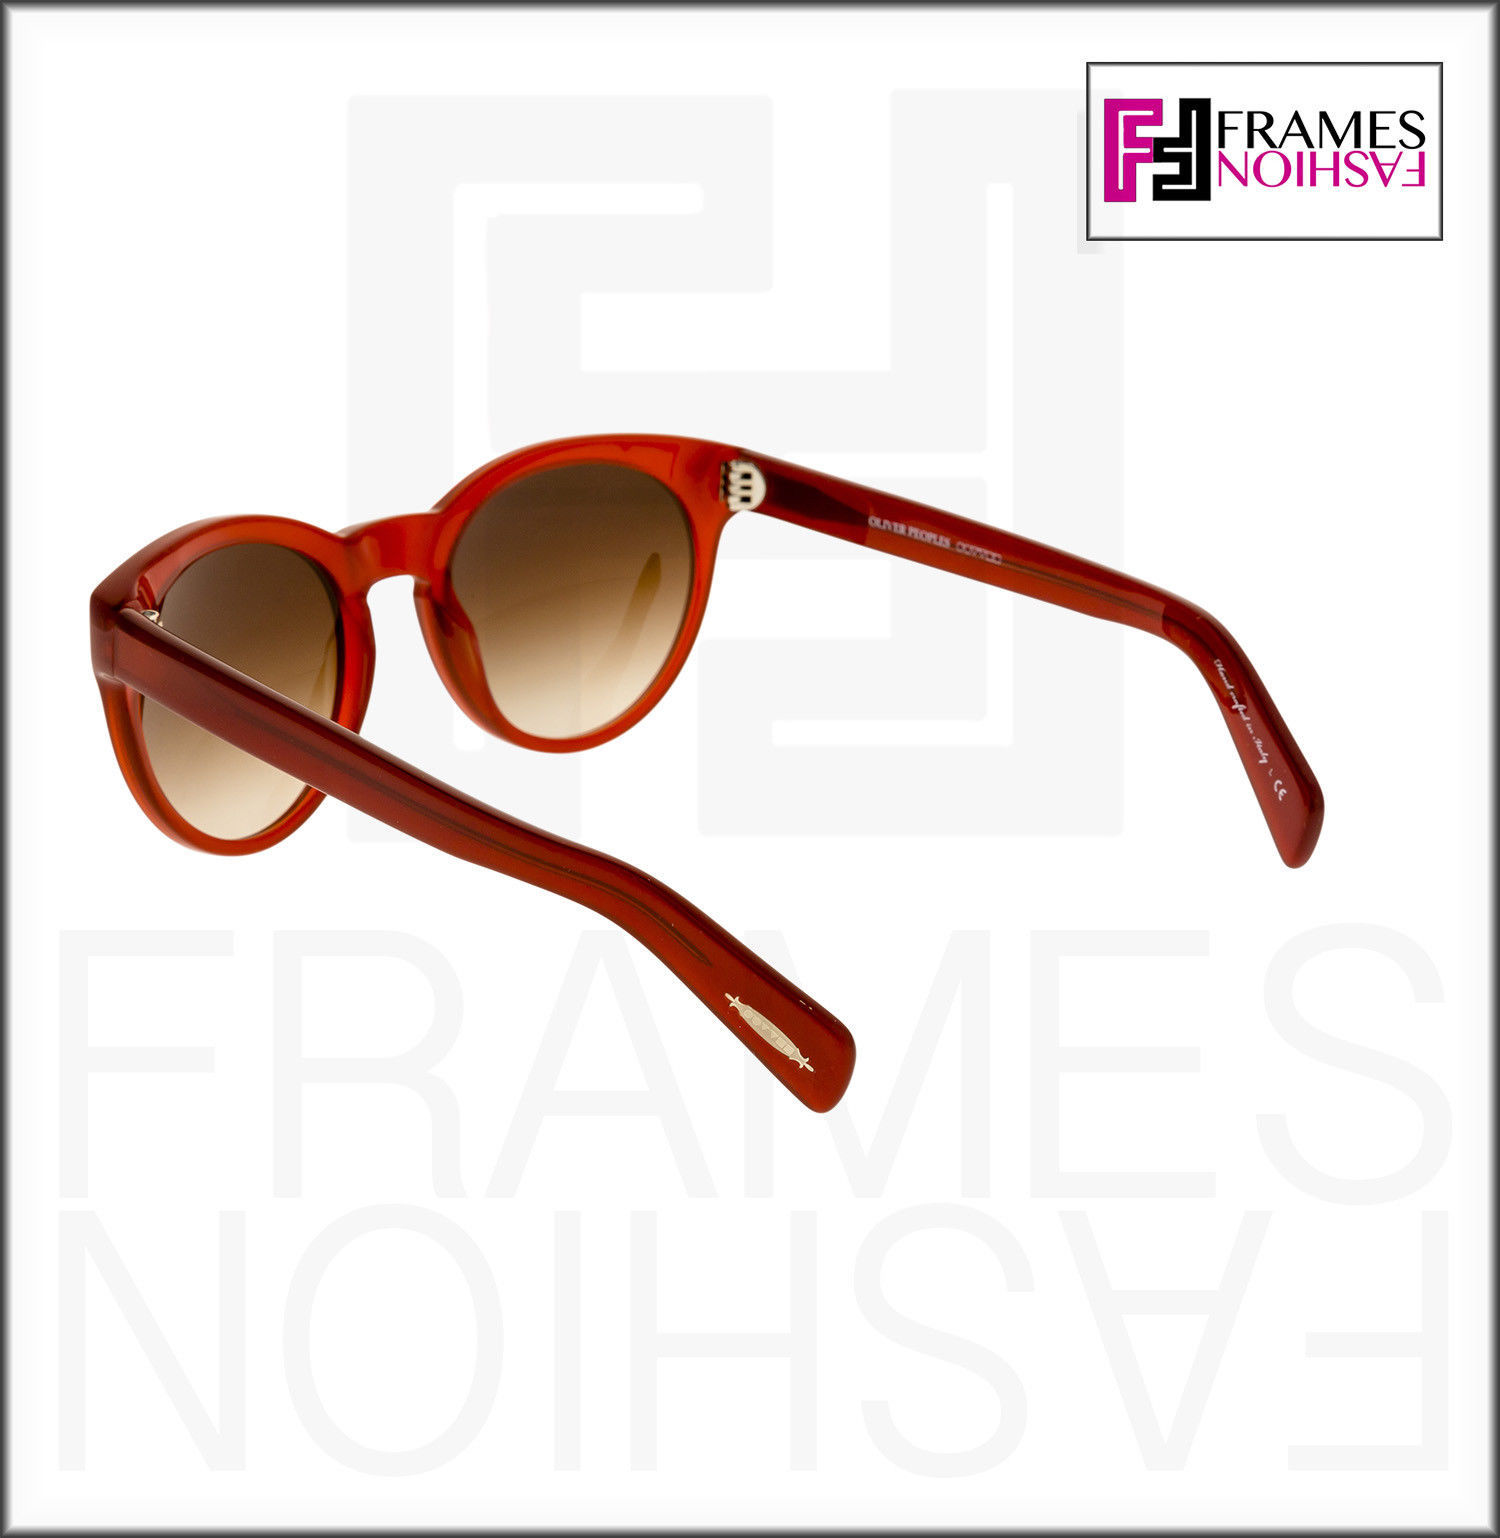 OLIVER PEOPLES ALIVIA OV5216S Red Blood Translucent Brown Round Sunglasses 5216 image 3